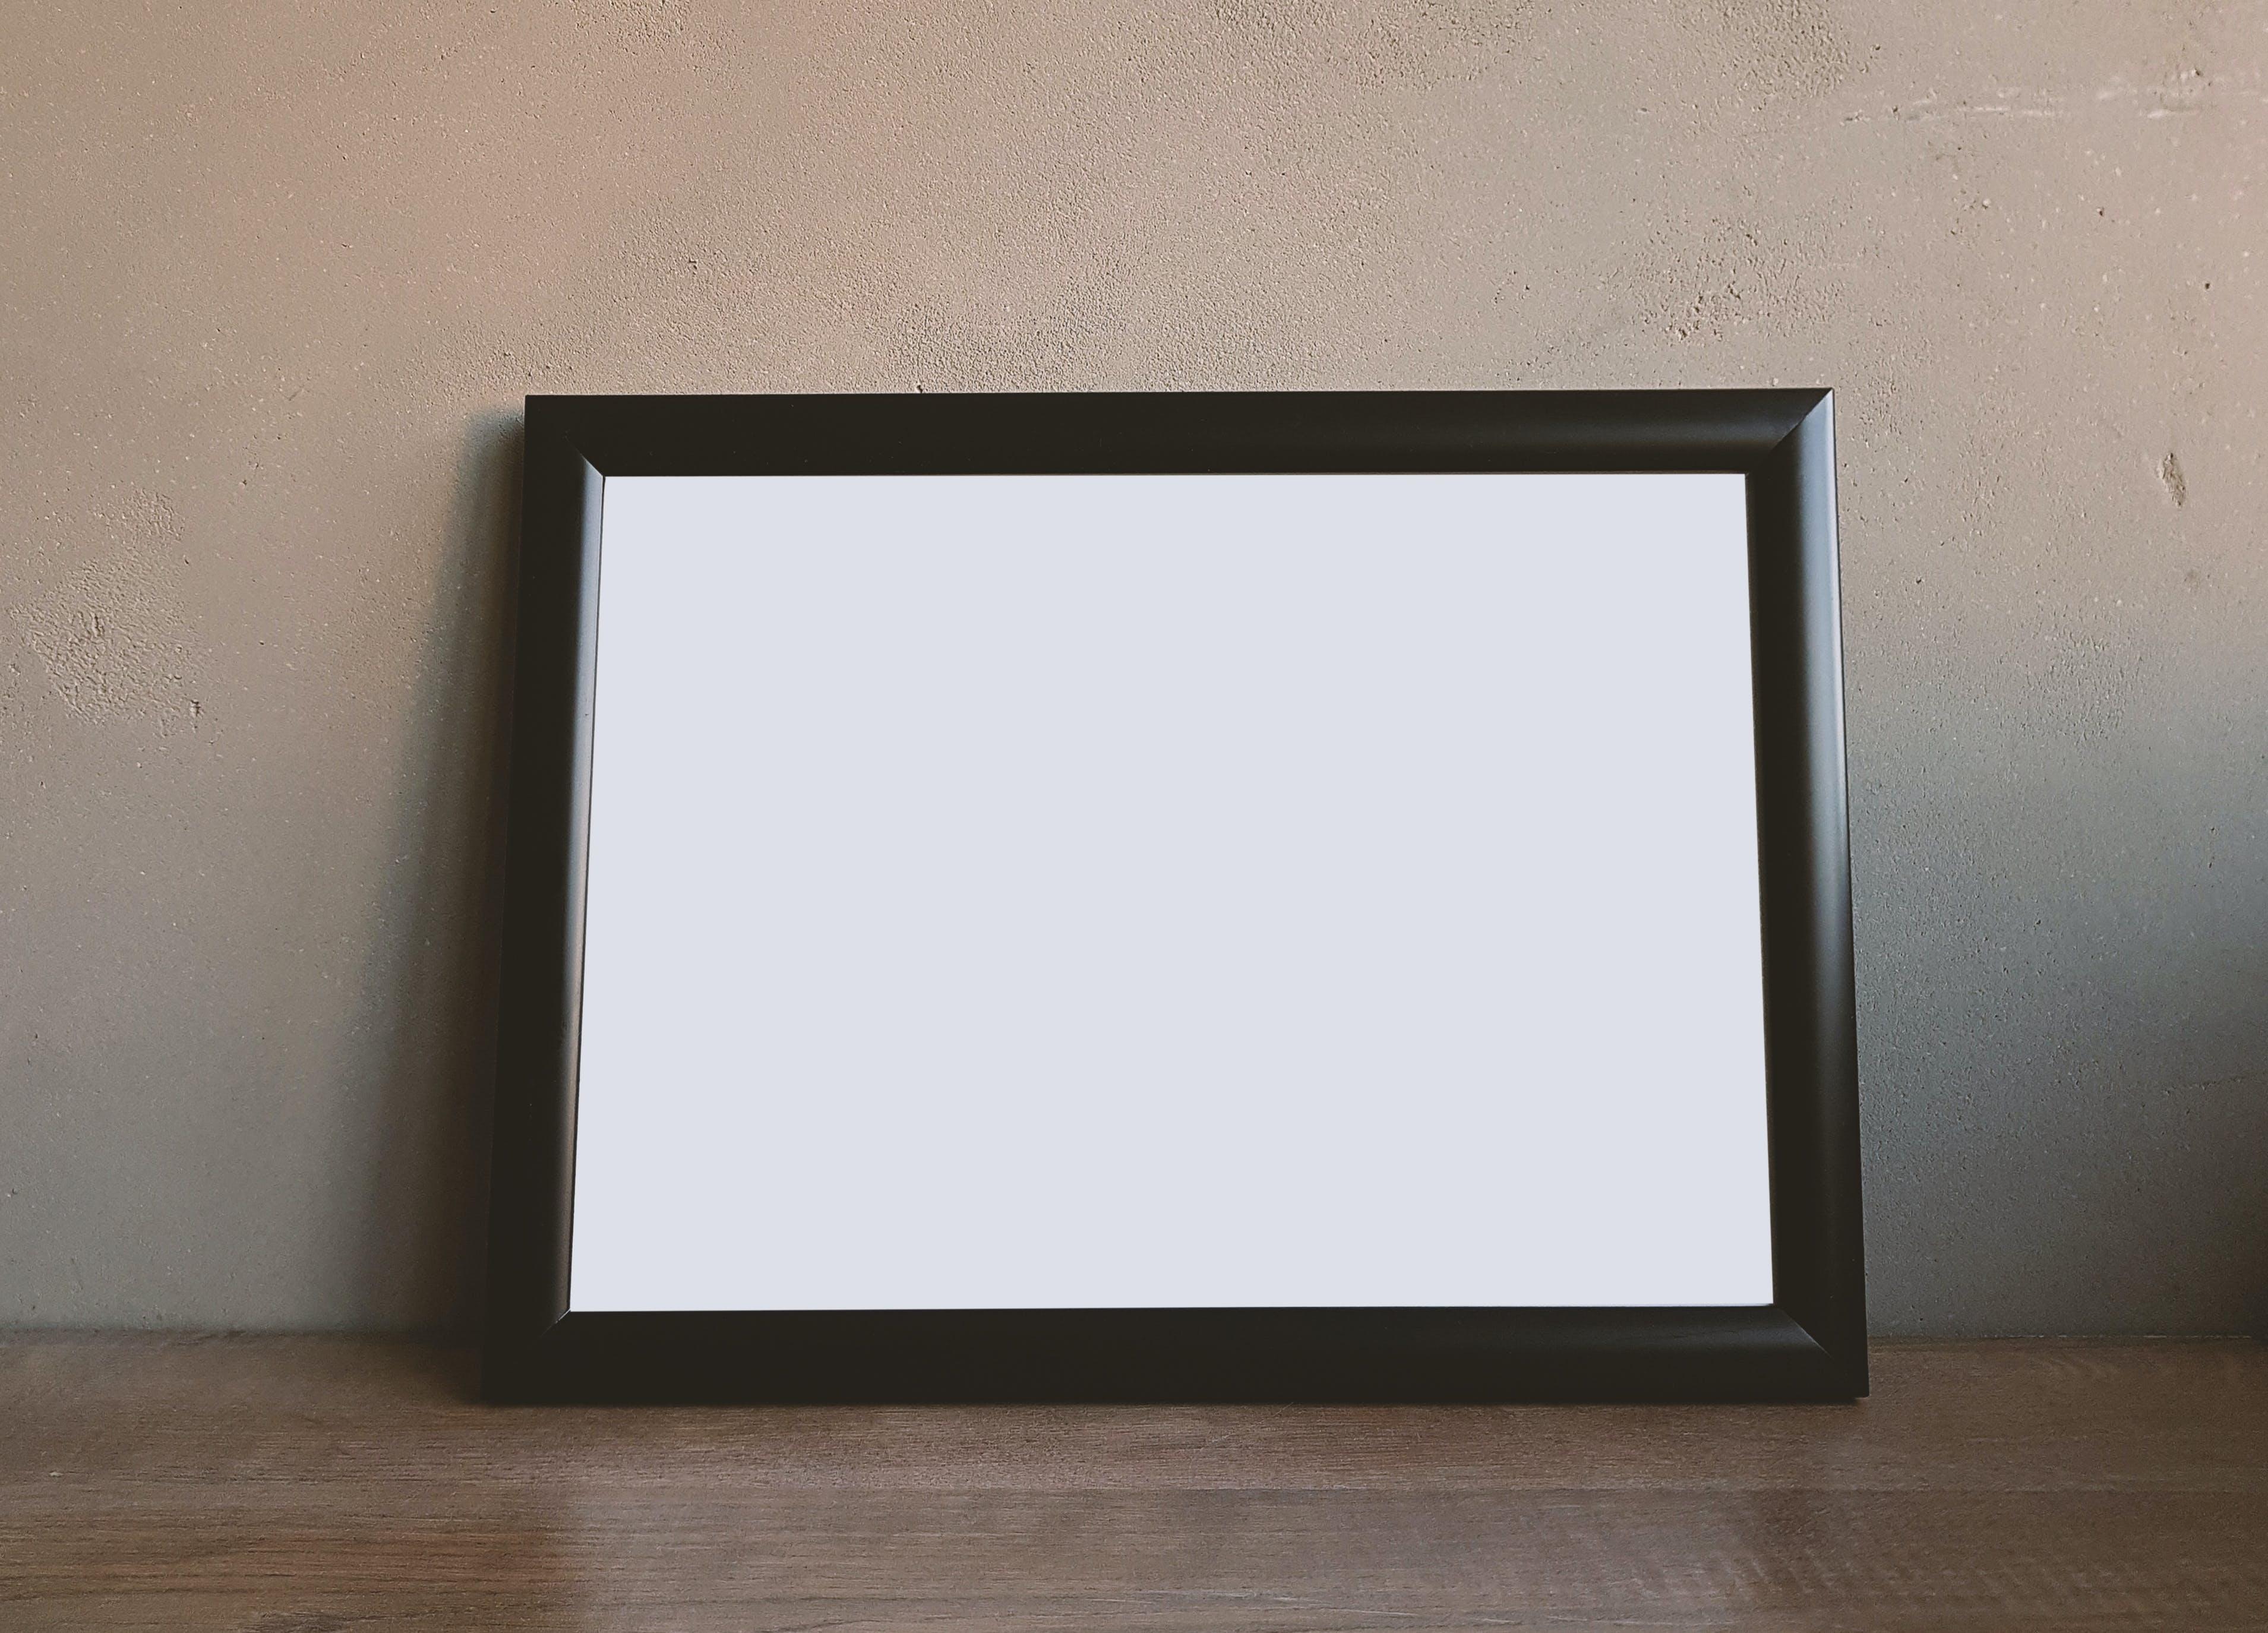 Brown Wooden Rectangular Photo Frame